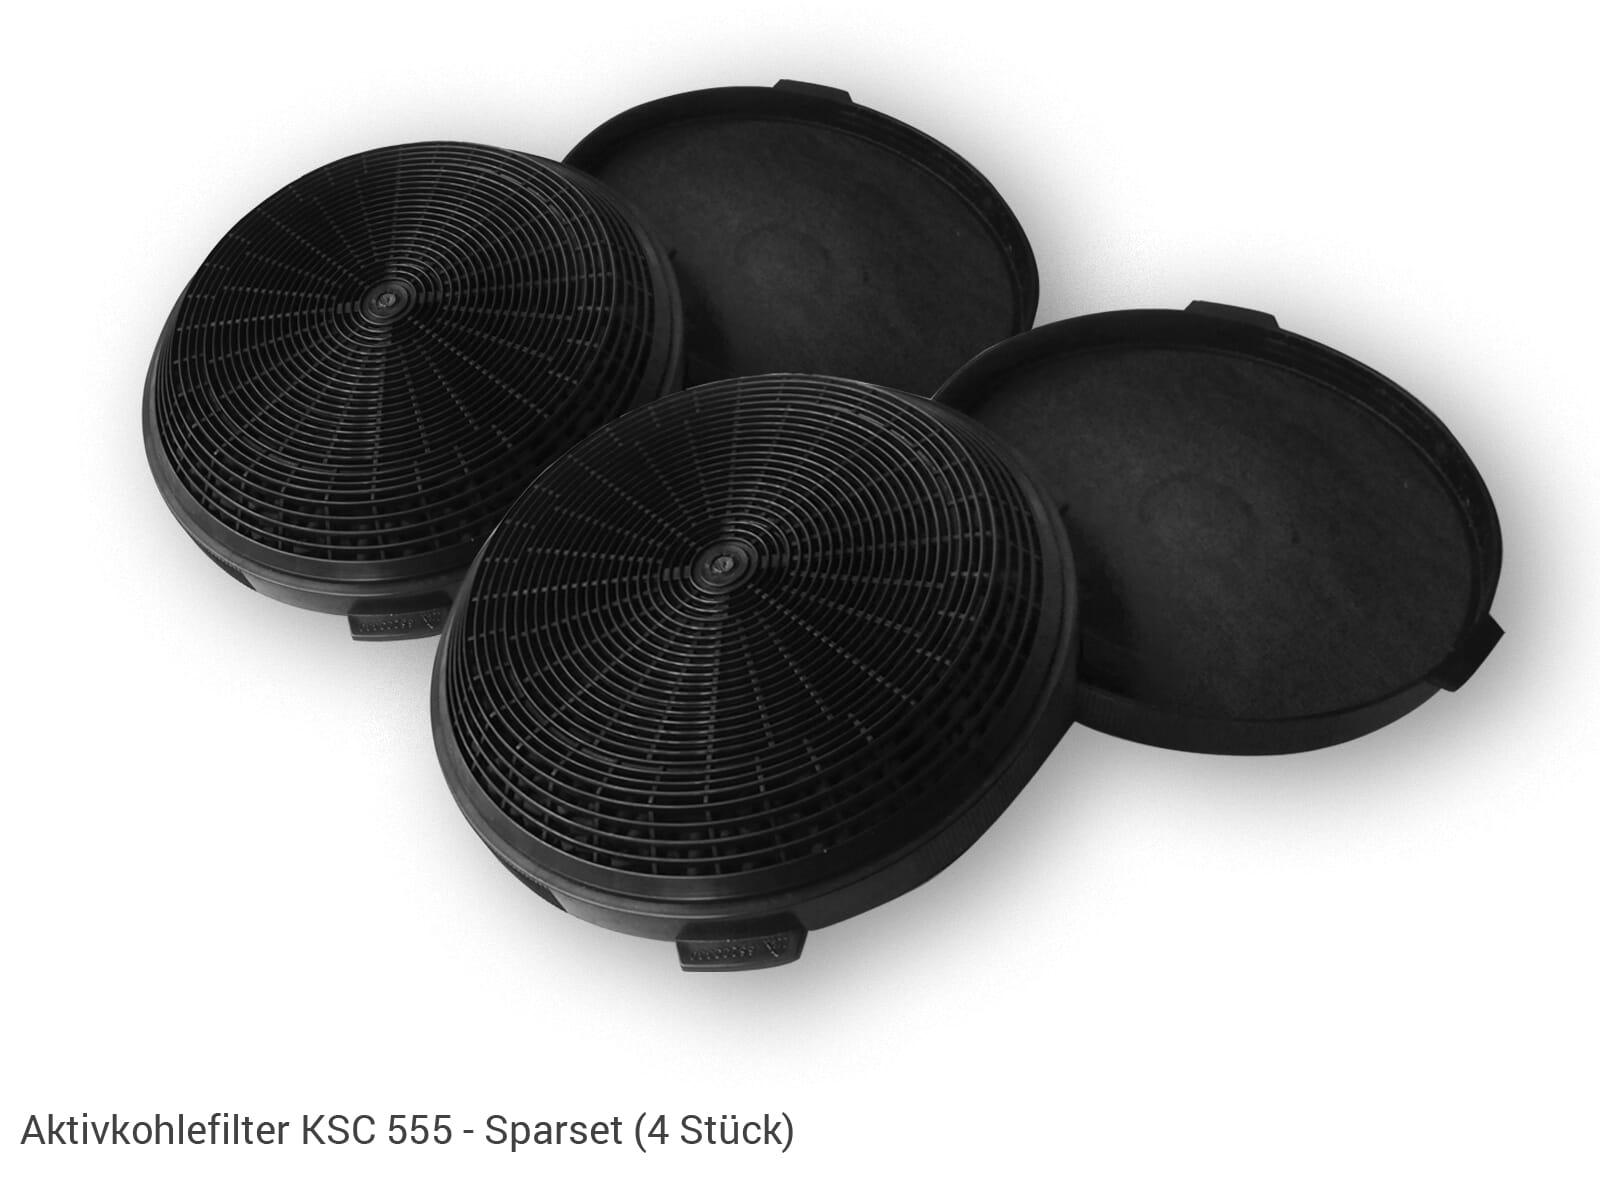 Oranier KSC 555 Aktiv-Kohlefilter Sparset (4 Stück)